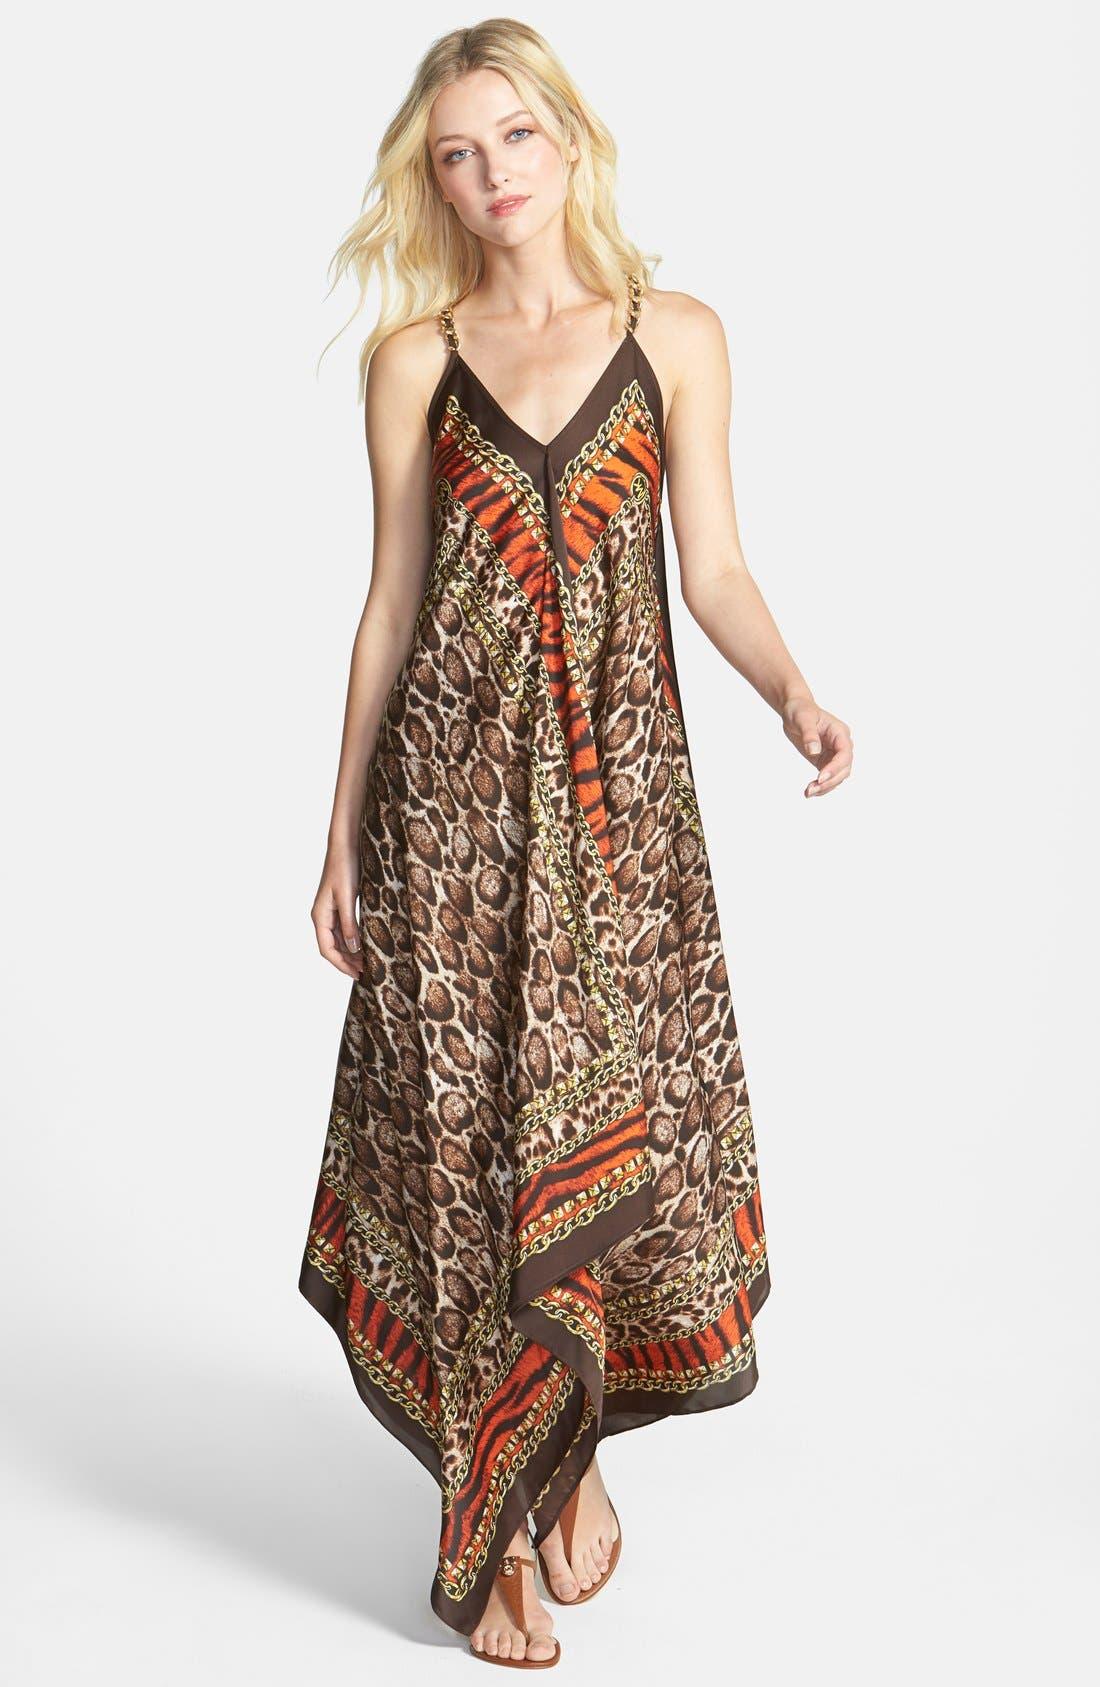 Alternate Image 1 Selected - MICHAEL Michael Kors 'Kasai' Scarf Print V-Neck Maxi Dress